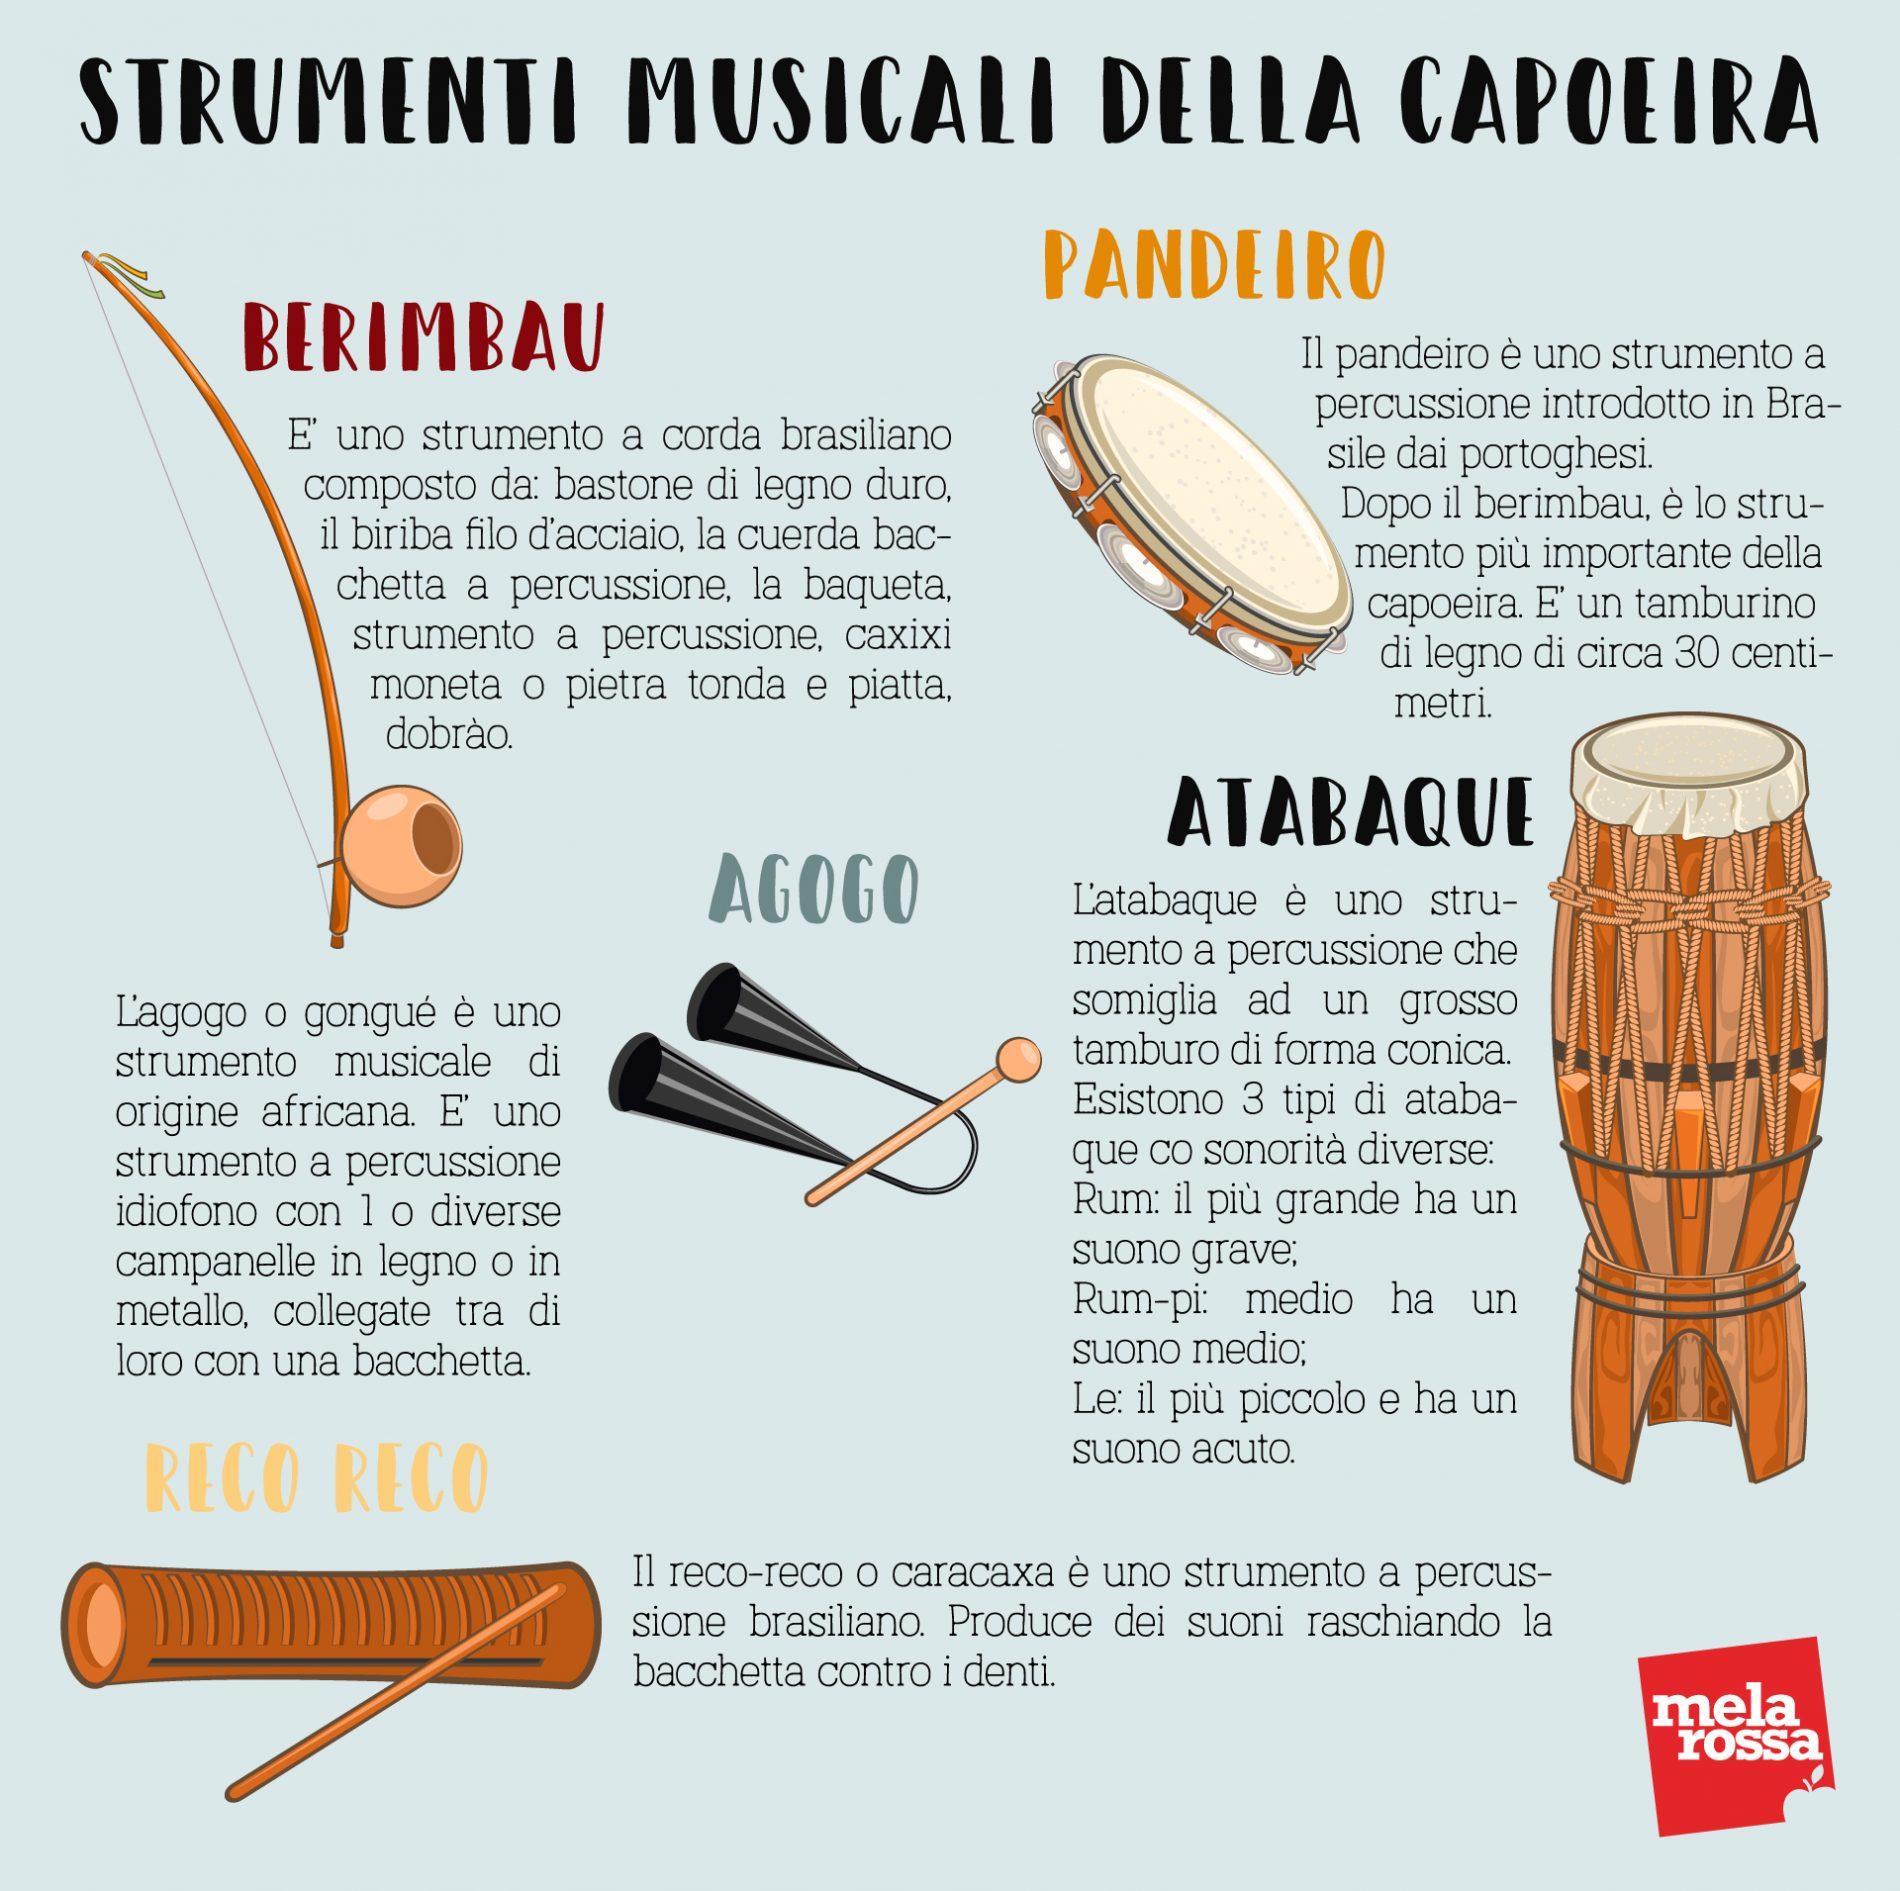 CApoeira: strumenti musicali